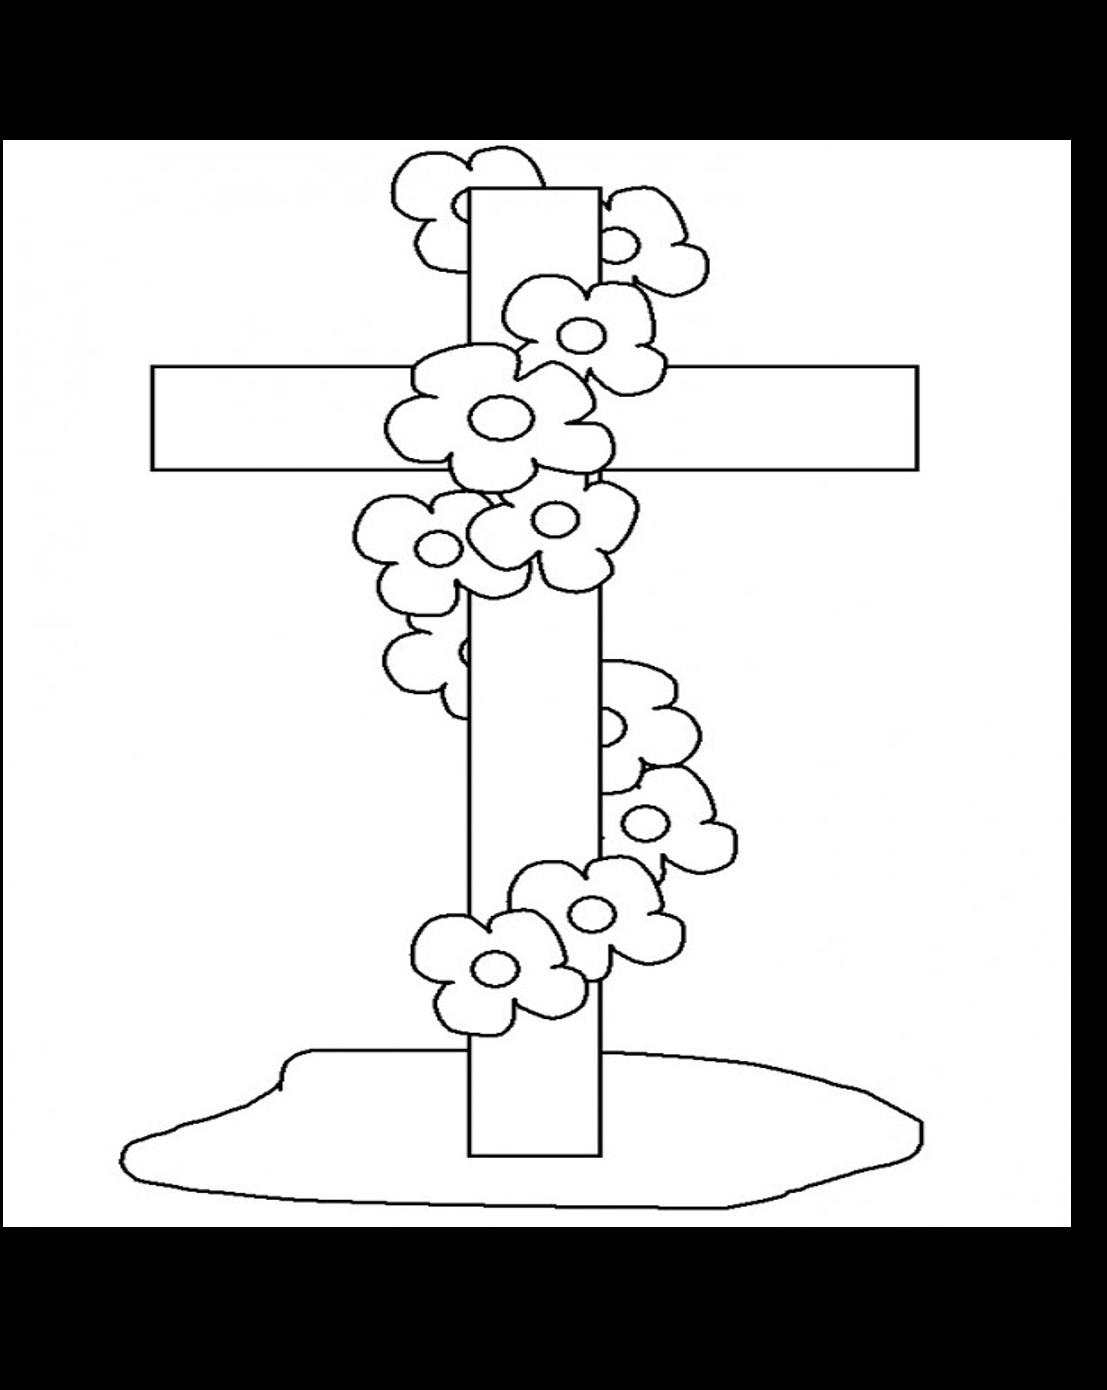 Vistoso Cruces Para Colorear Ilustración - Ideas Para Colorear ...